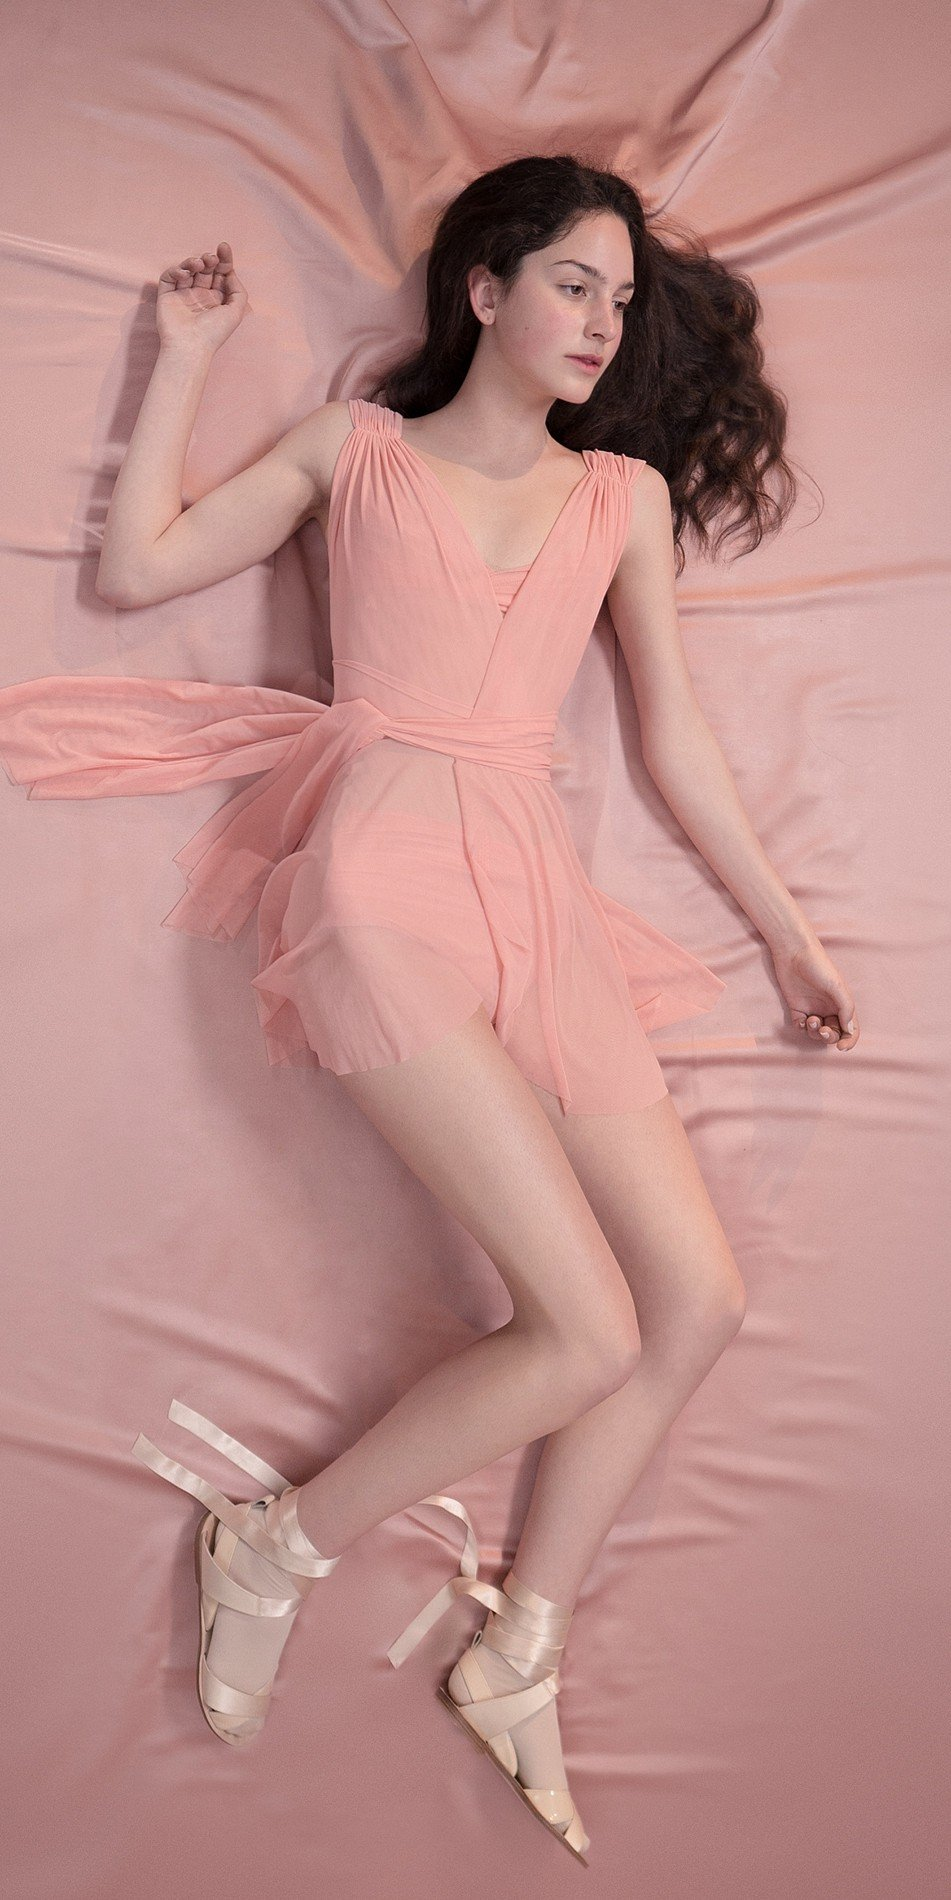 GRES draped20wrap20dress blush 4 r 2